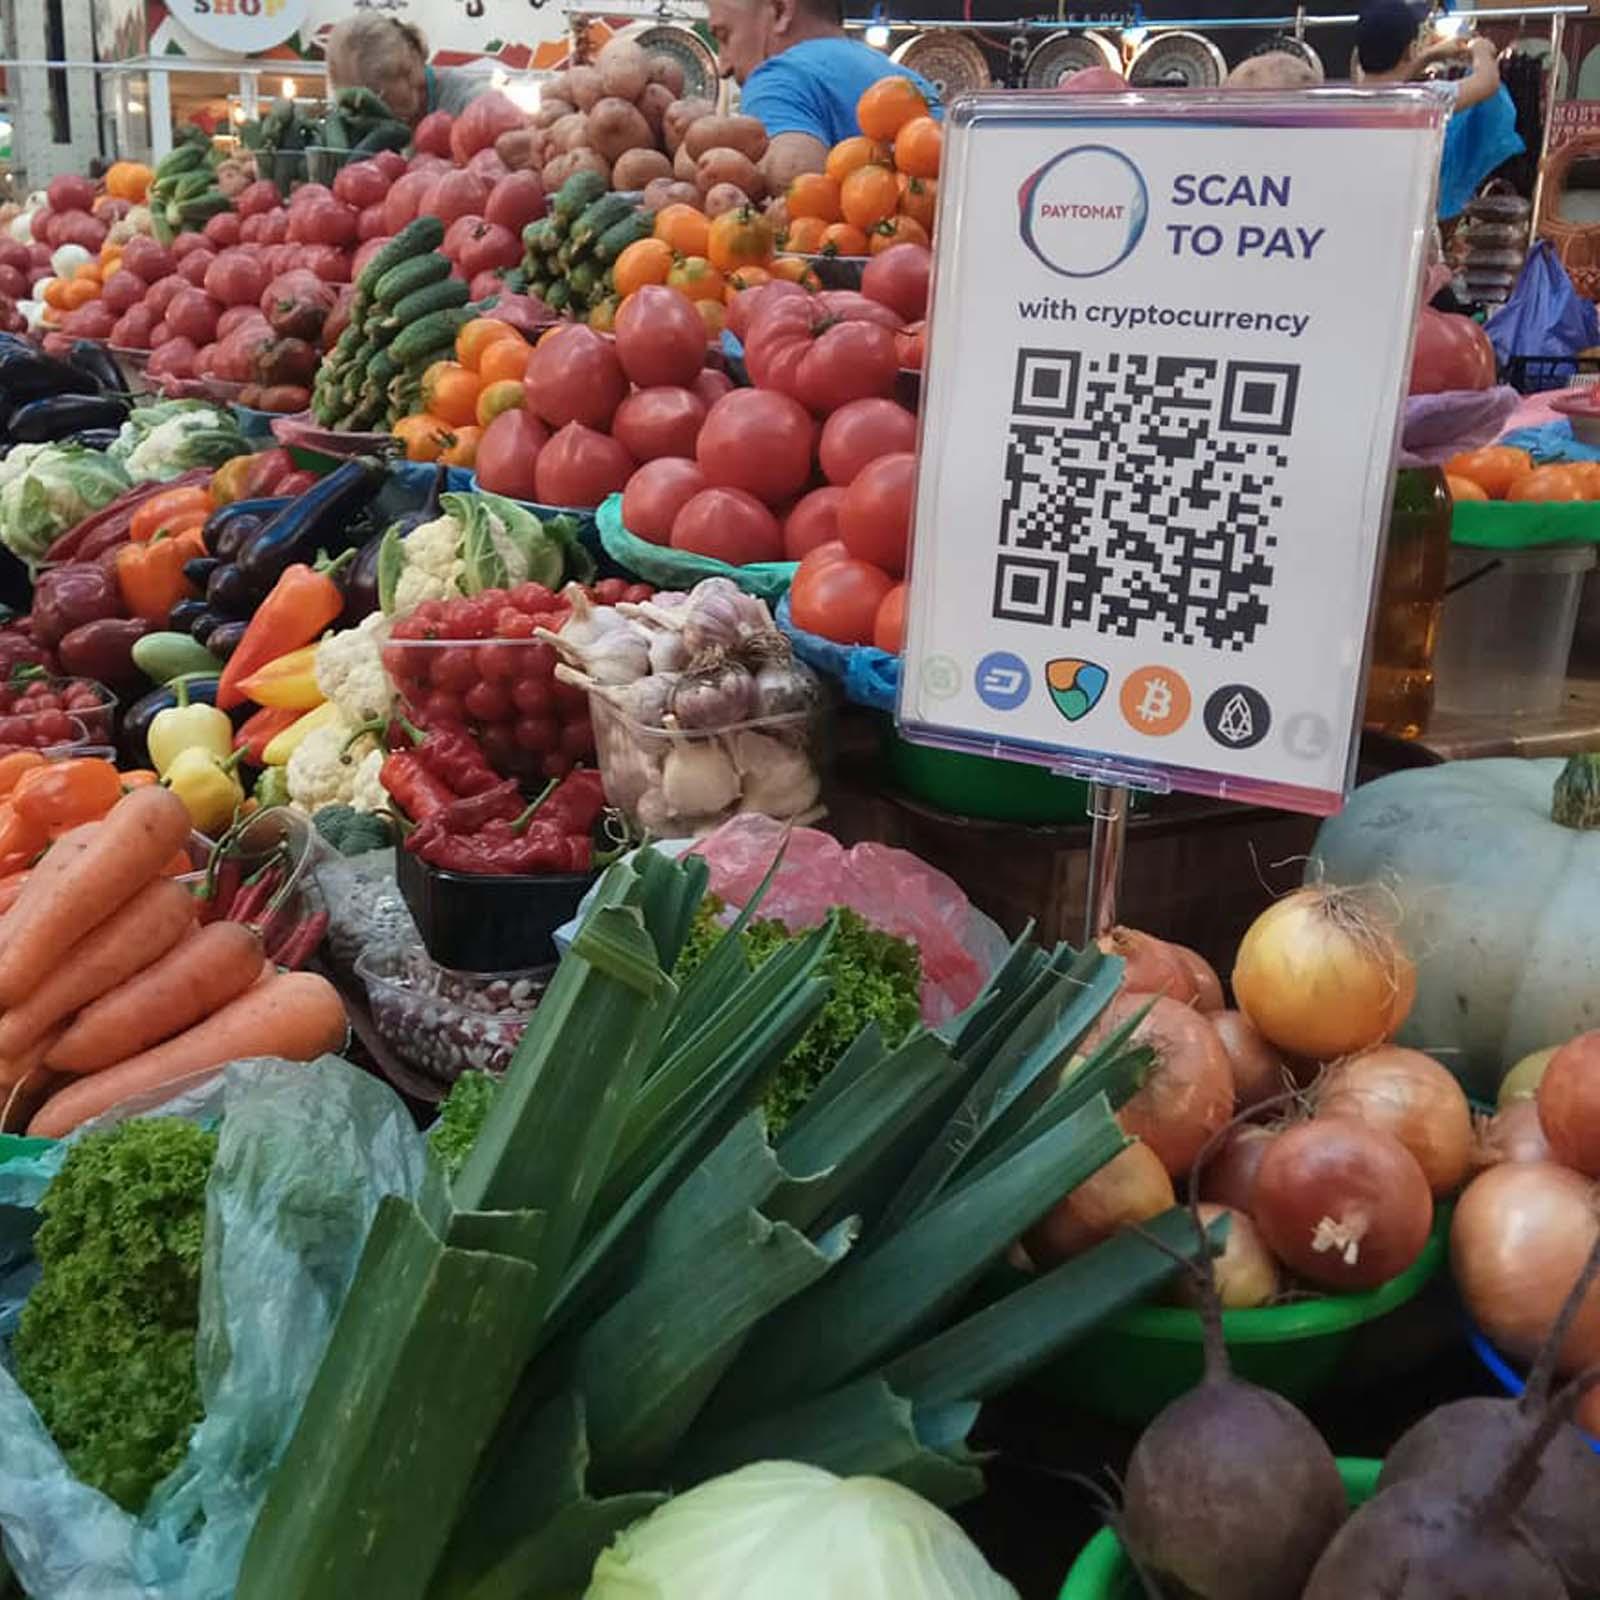 Kiev's Bessarabsky Market Accepts Cryptocurrencies for Groceries